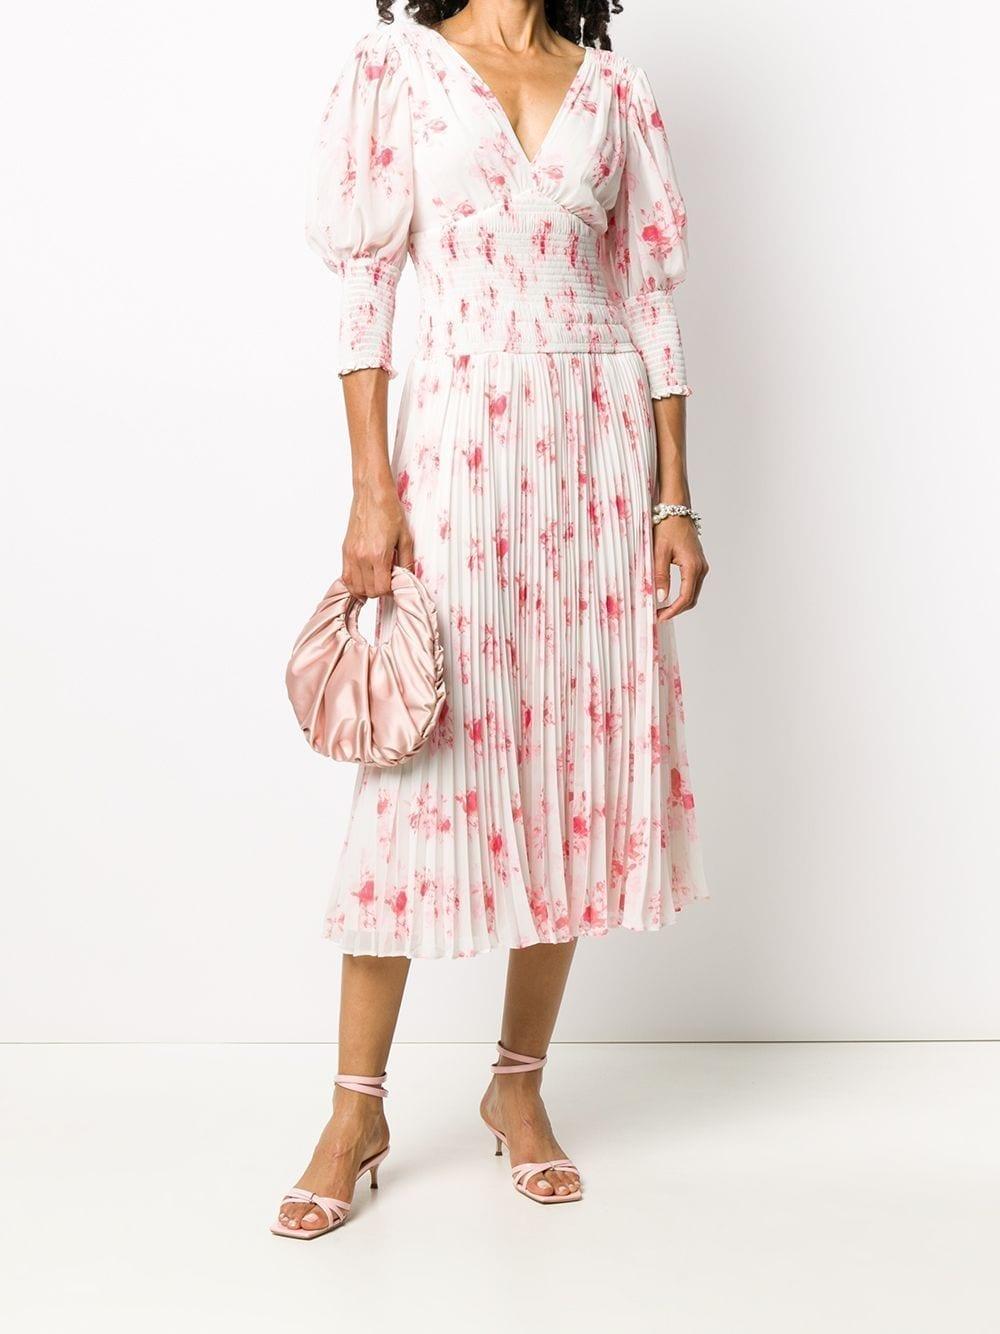 SELF-PORTRAIT Floral Print Pleated Dress